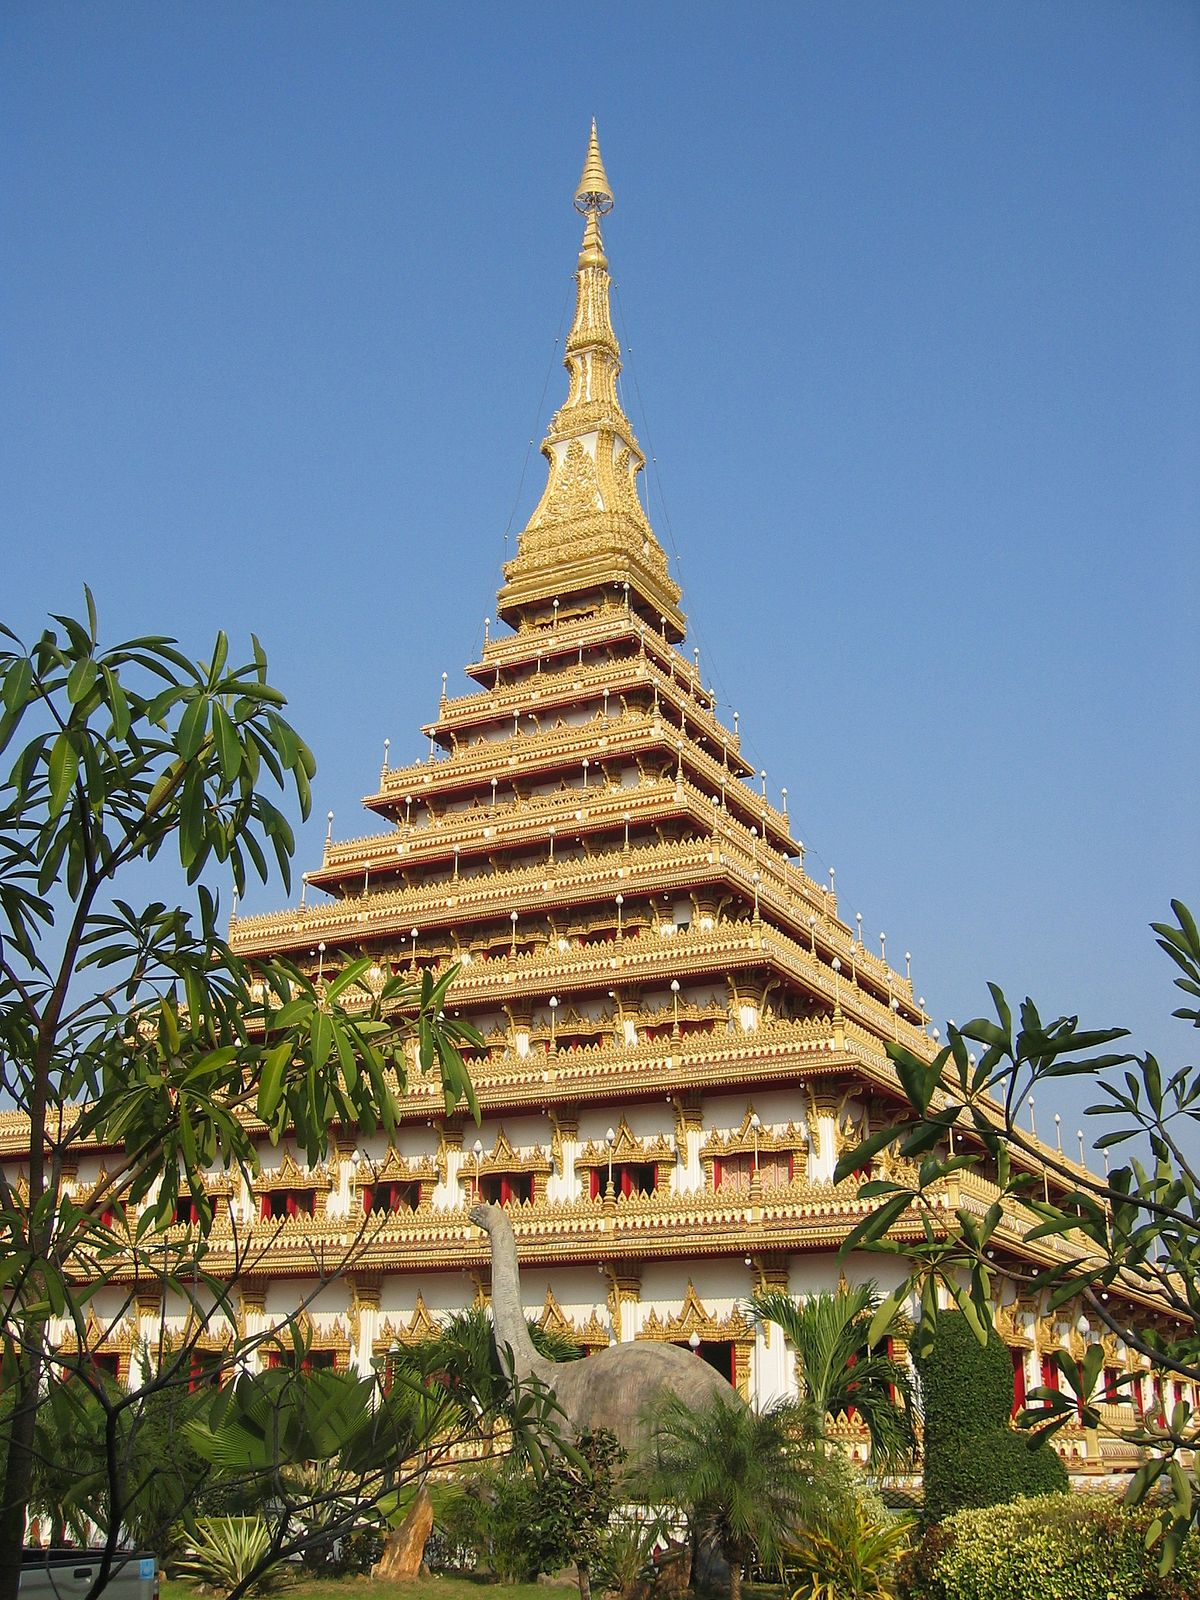 Khon Kaen  Reisefhrer auf Wikivoyage